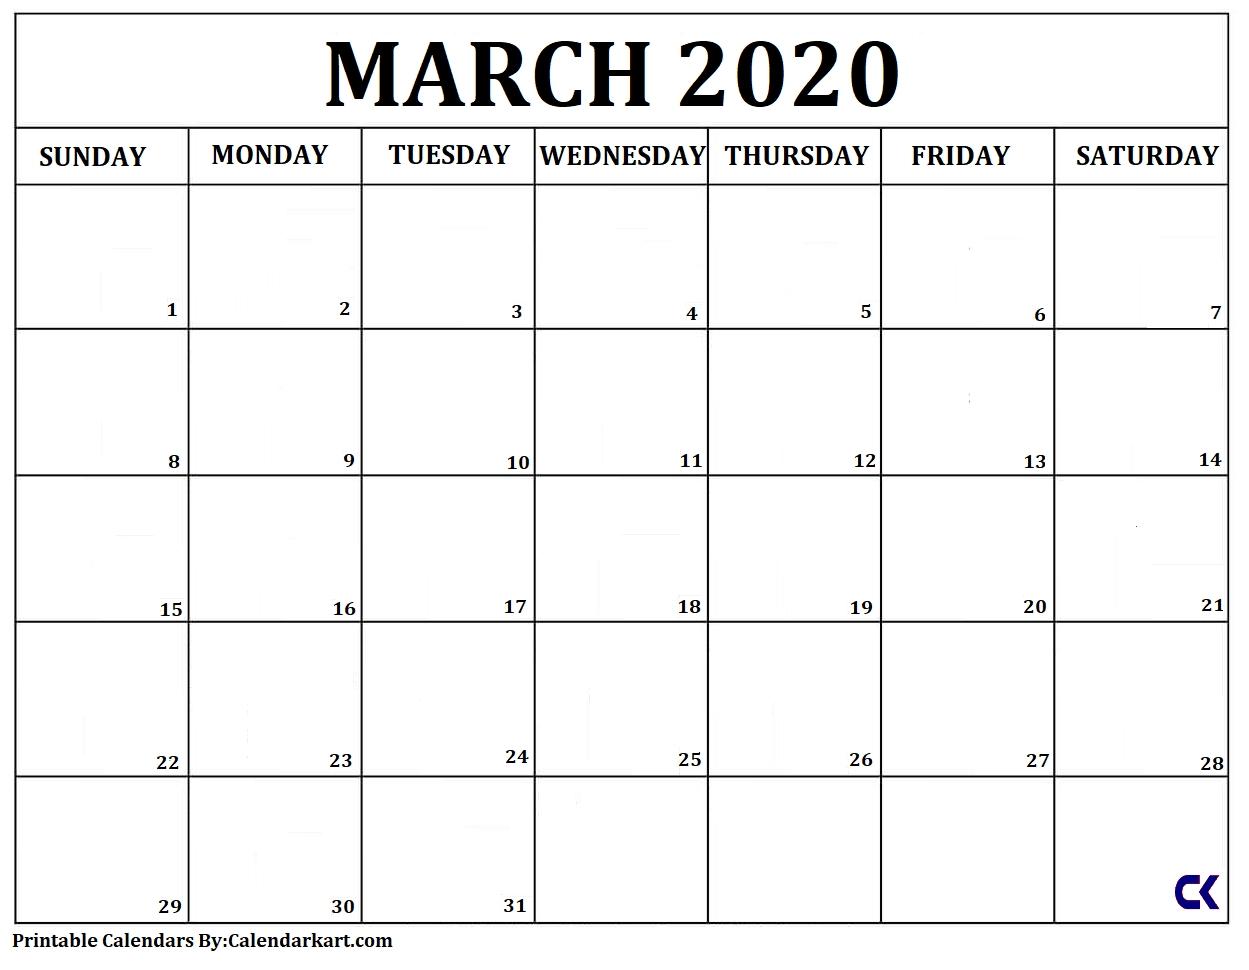 Free Printable Calendar Templates 2020 » Calendarkart